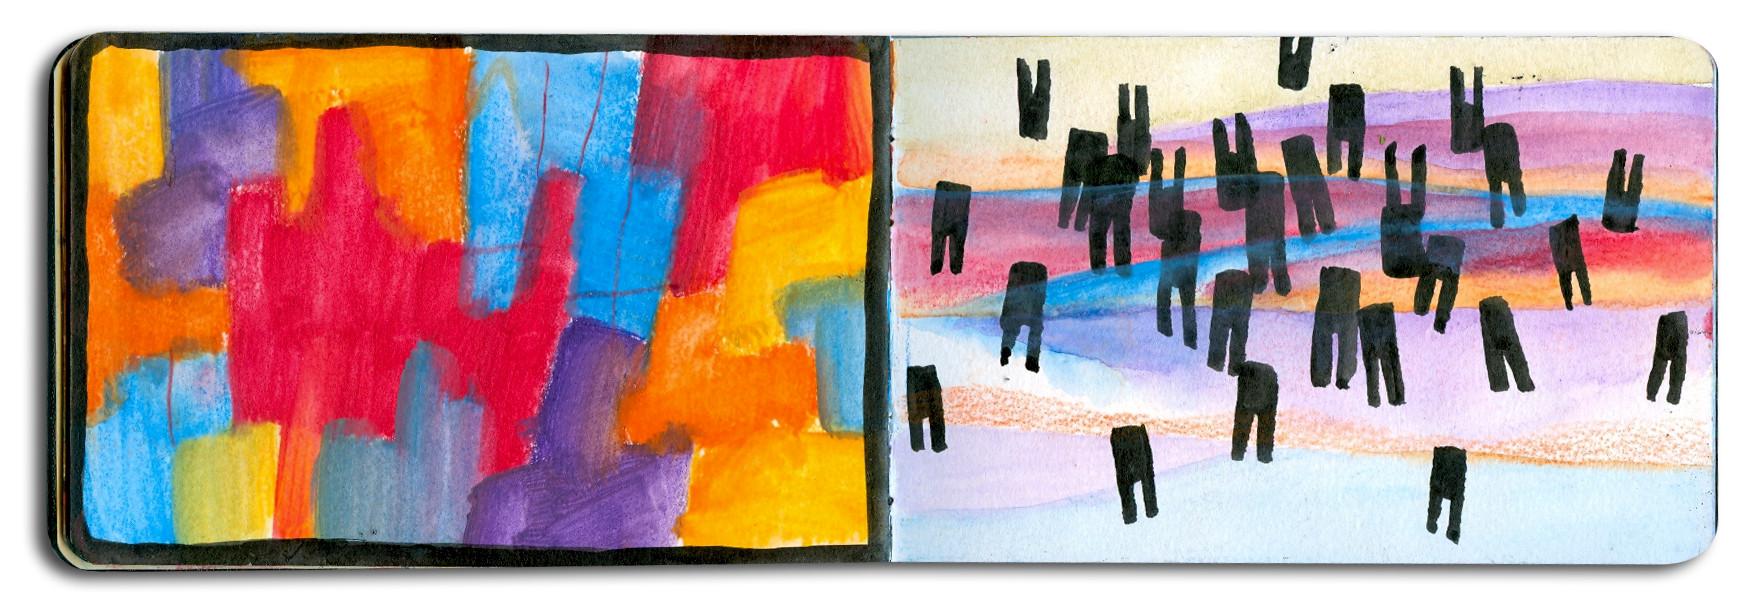 sketchbook small 2011/05